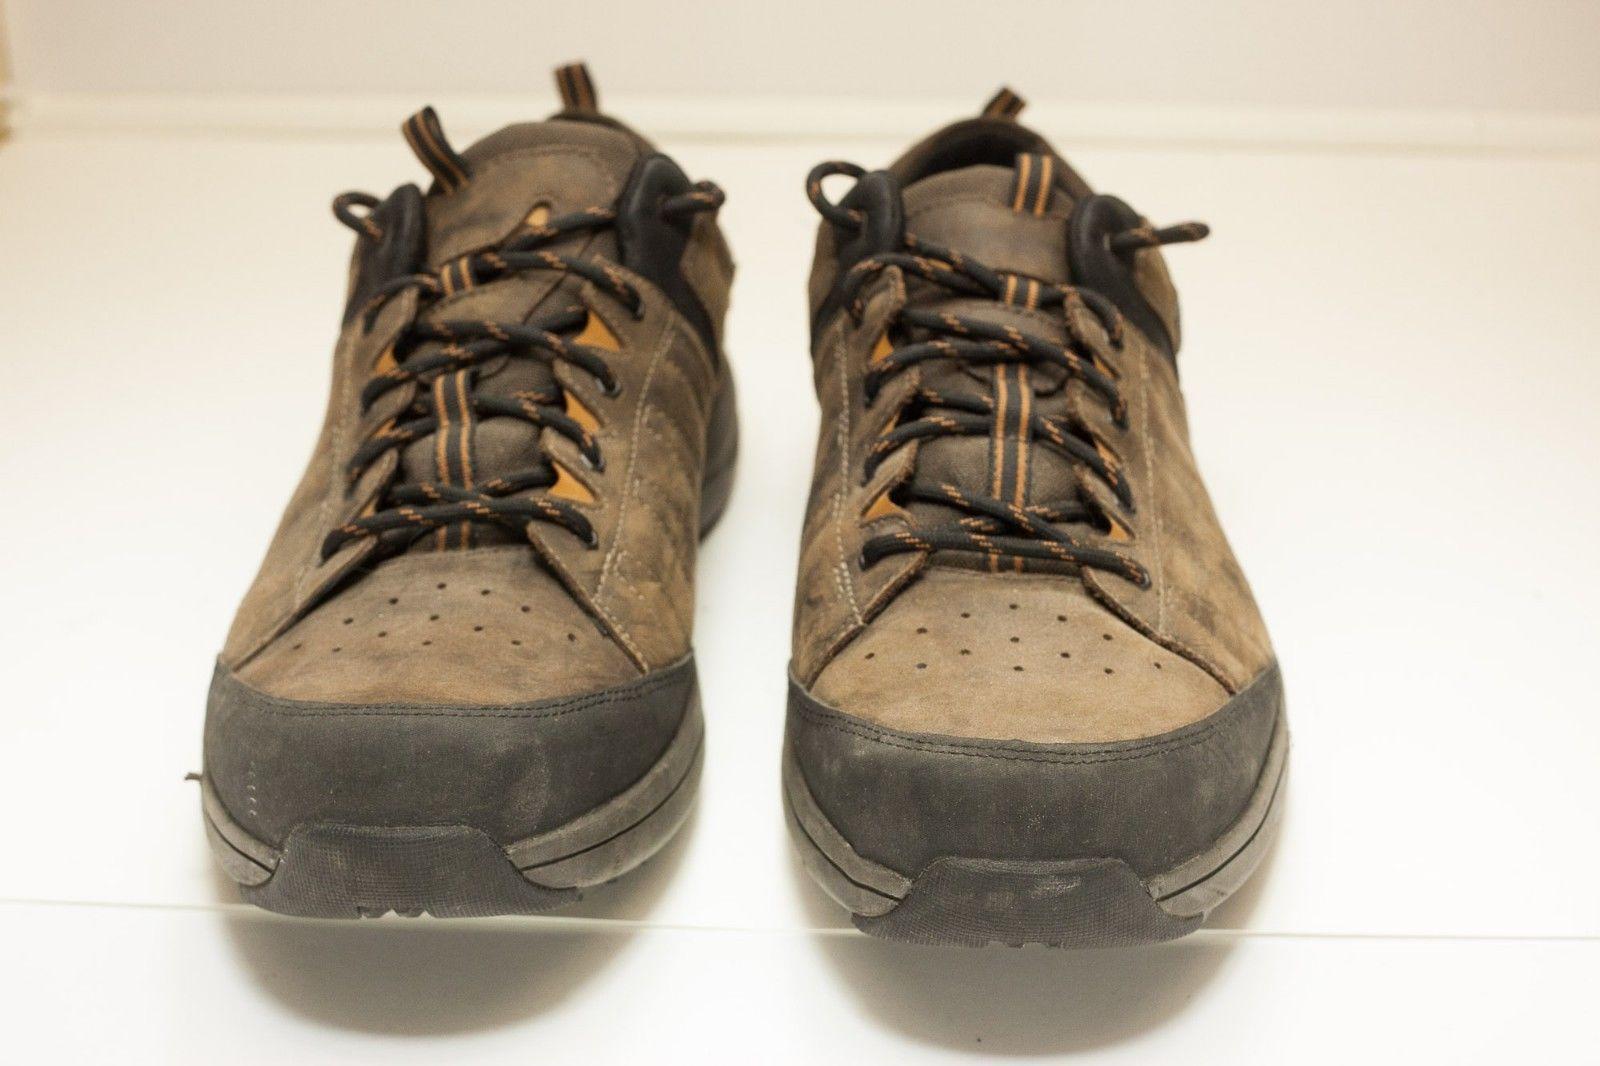 Dunham Seth-dun Waterproof 14 EE Brown Lace Up Men's